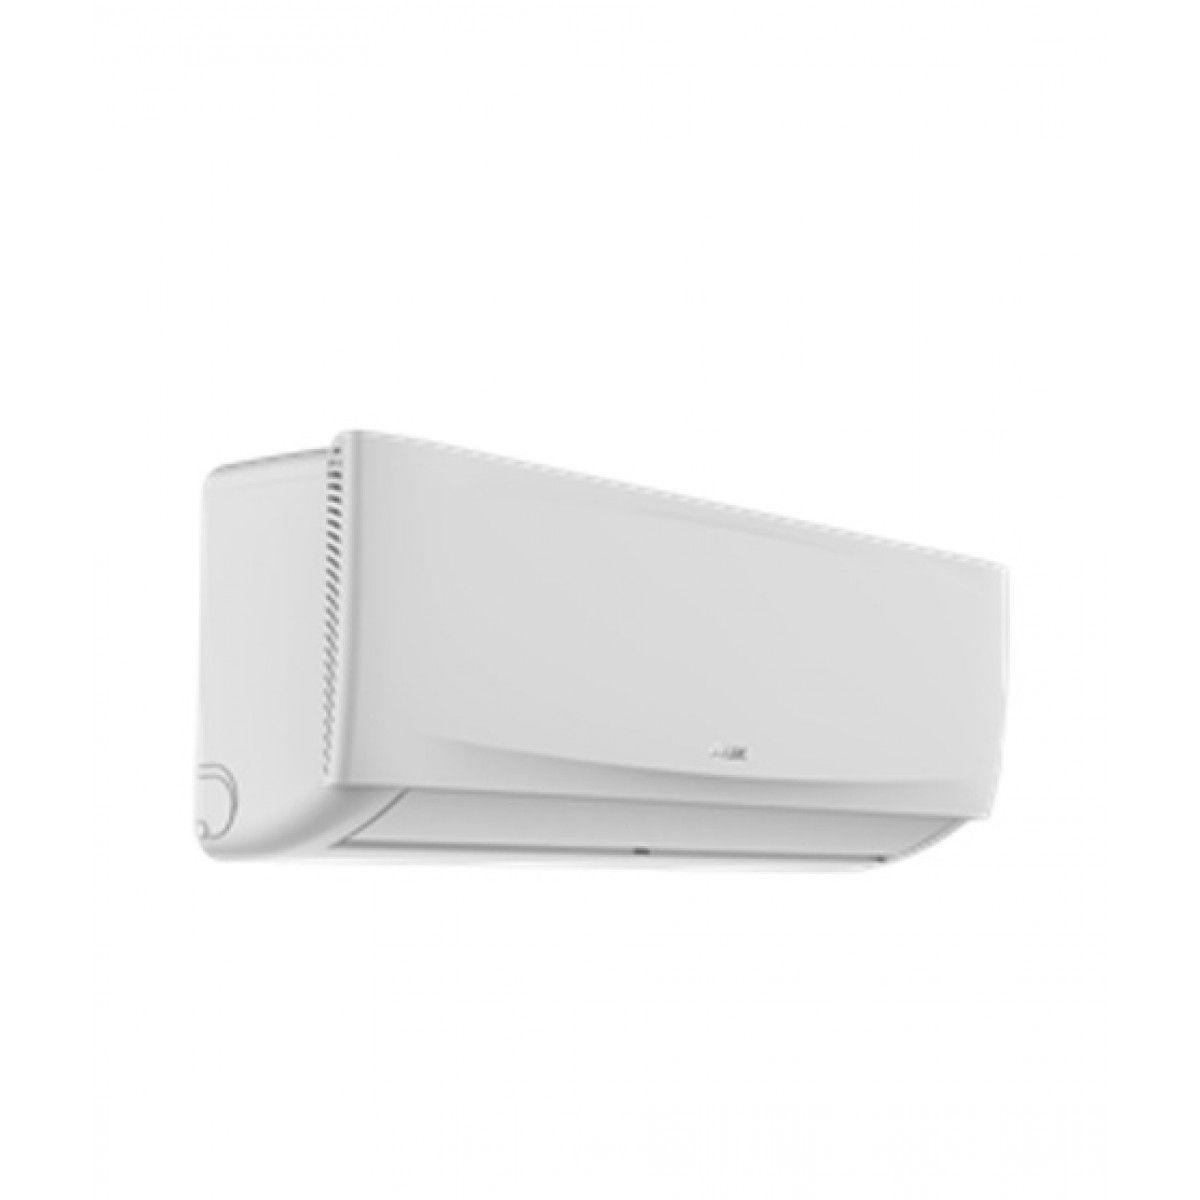 PEL Majestic 4D Split Air Conditioner 2.0 Ton (PSAC-24K)